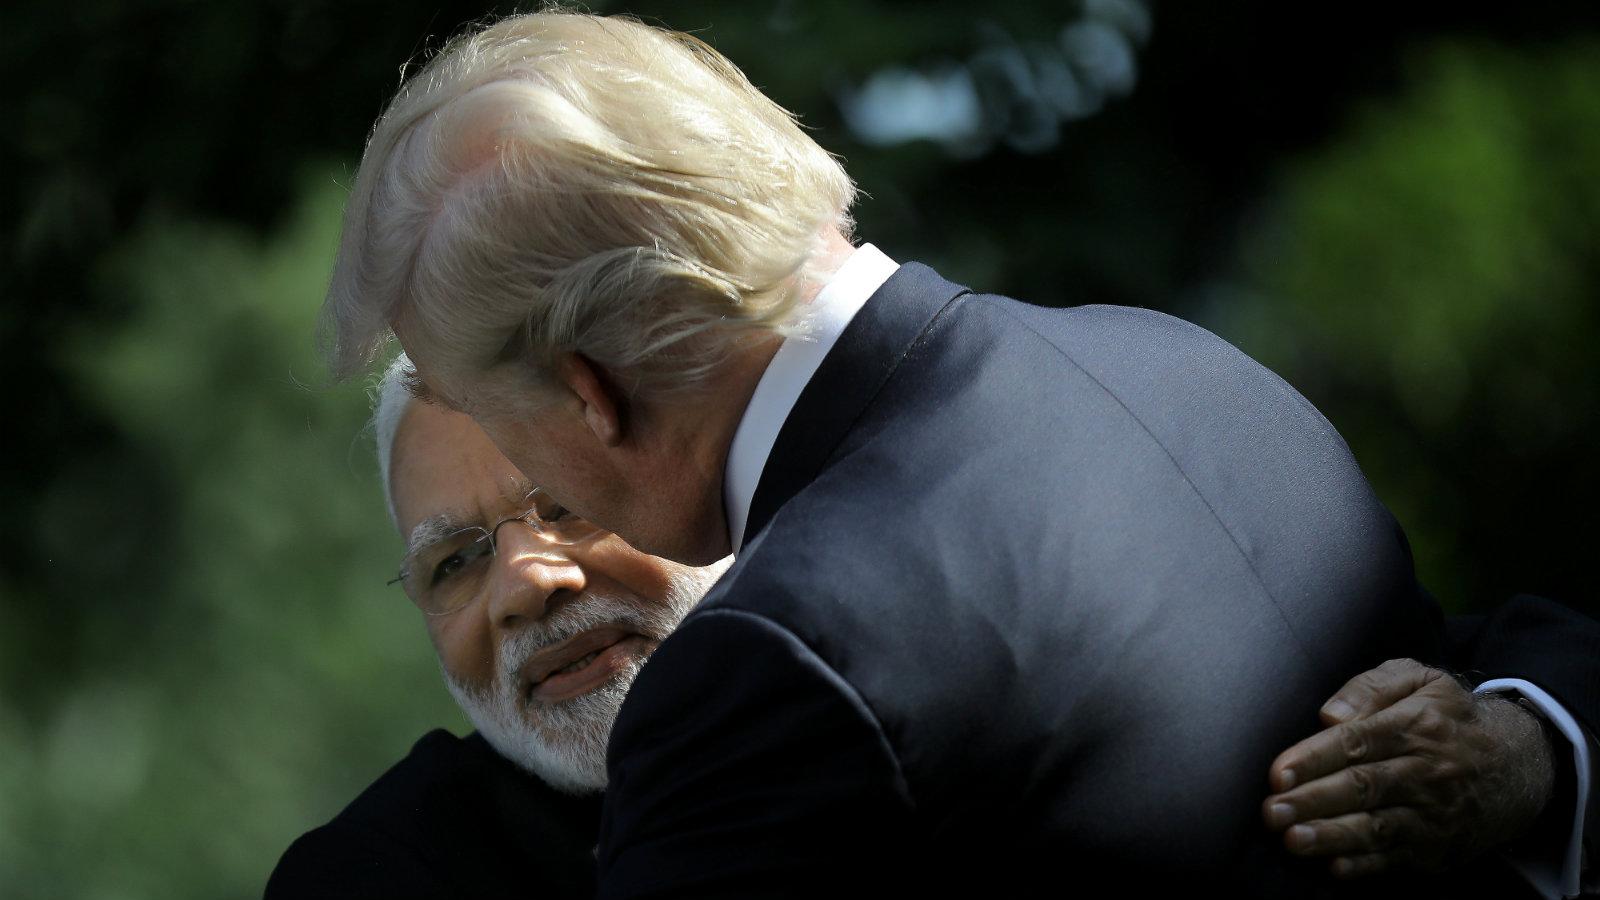 Prime minister Narendra Modi hugs US president Donald Trump in the Rose Garden of the White House in Washington on June 26, 2017.